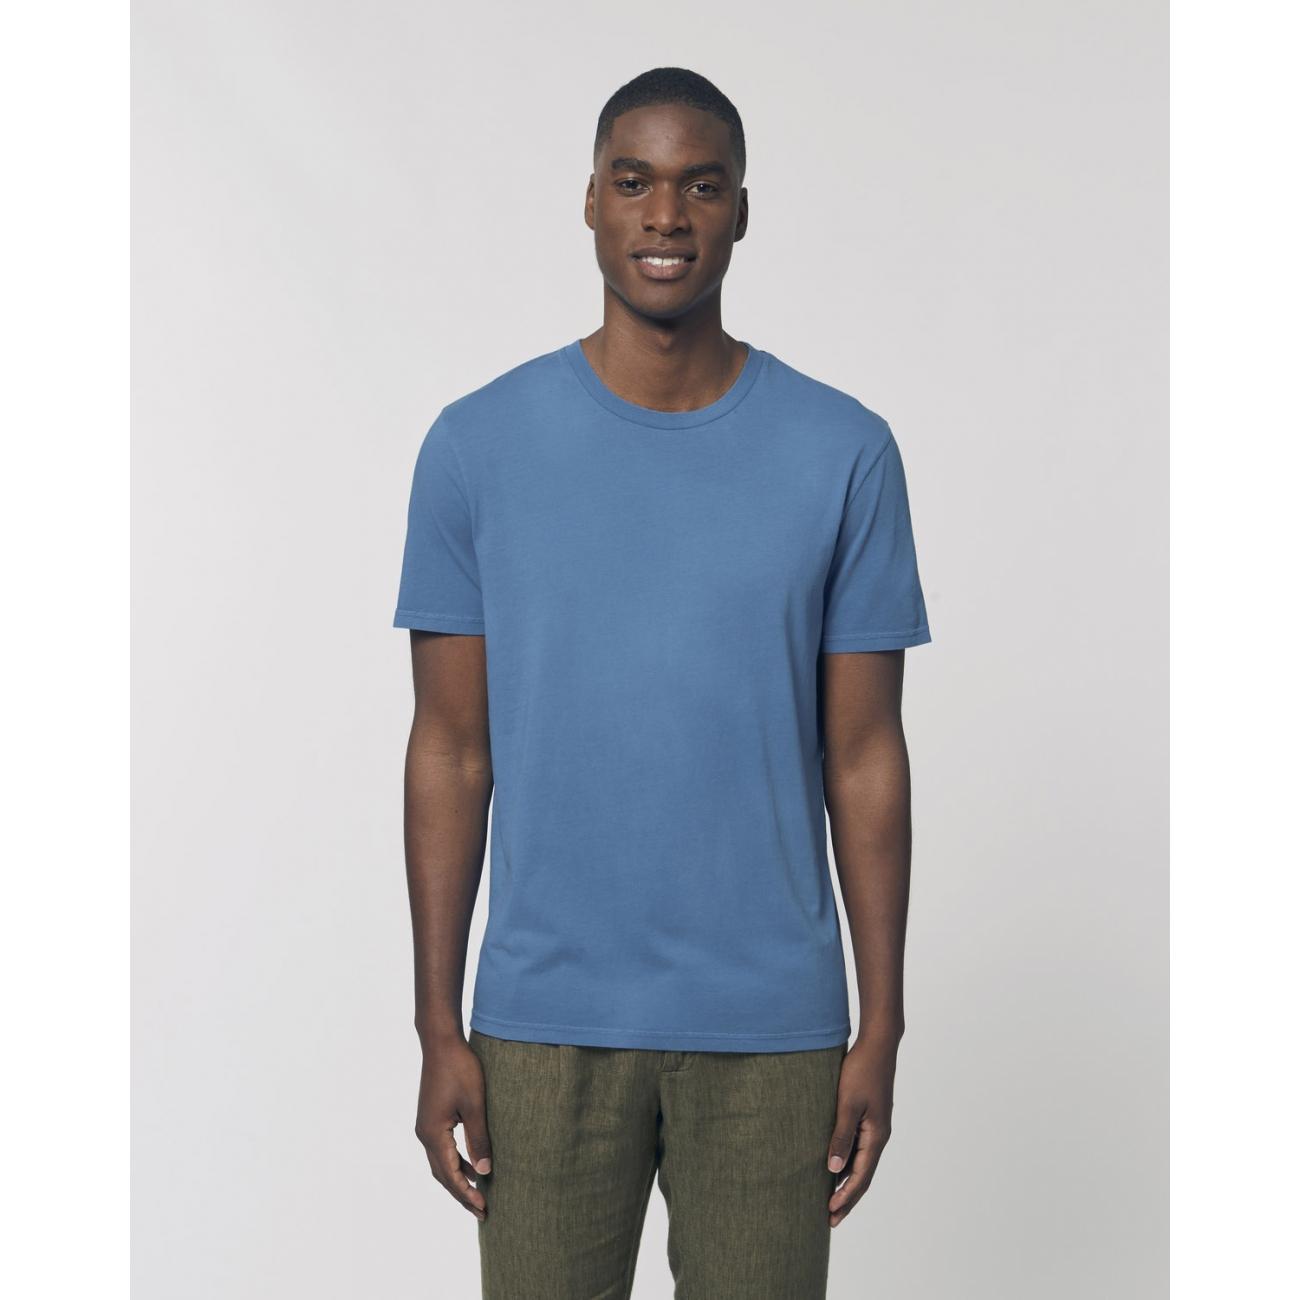 https://tee-shirt-bio.com/8616-thickbox_default/tee-shirt-style-vintage-delave-bleu-coton-bio-teinte-piece.jpg